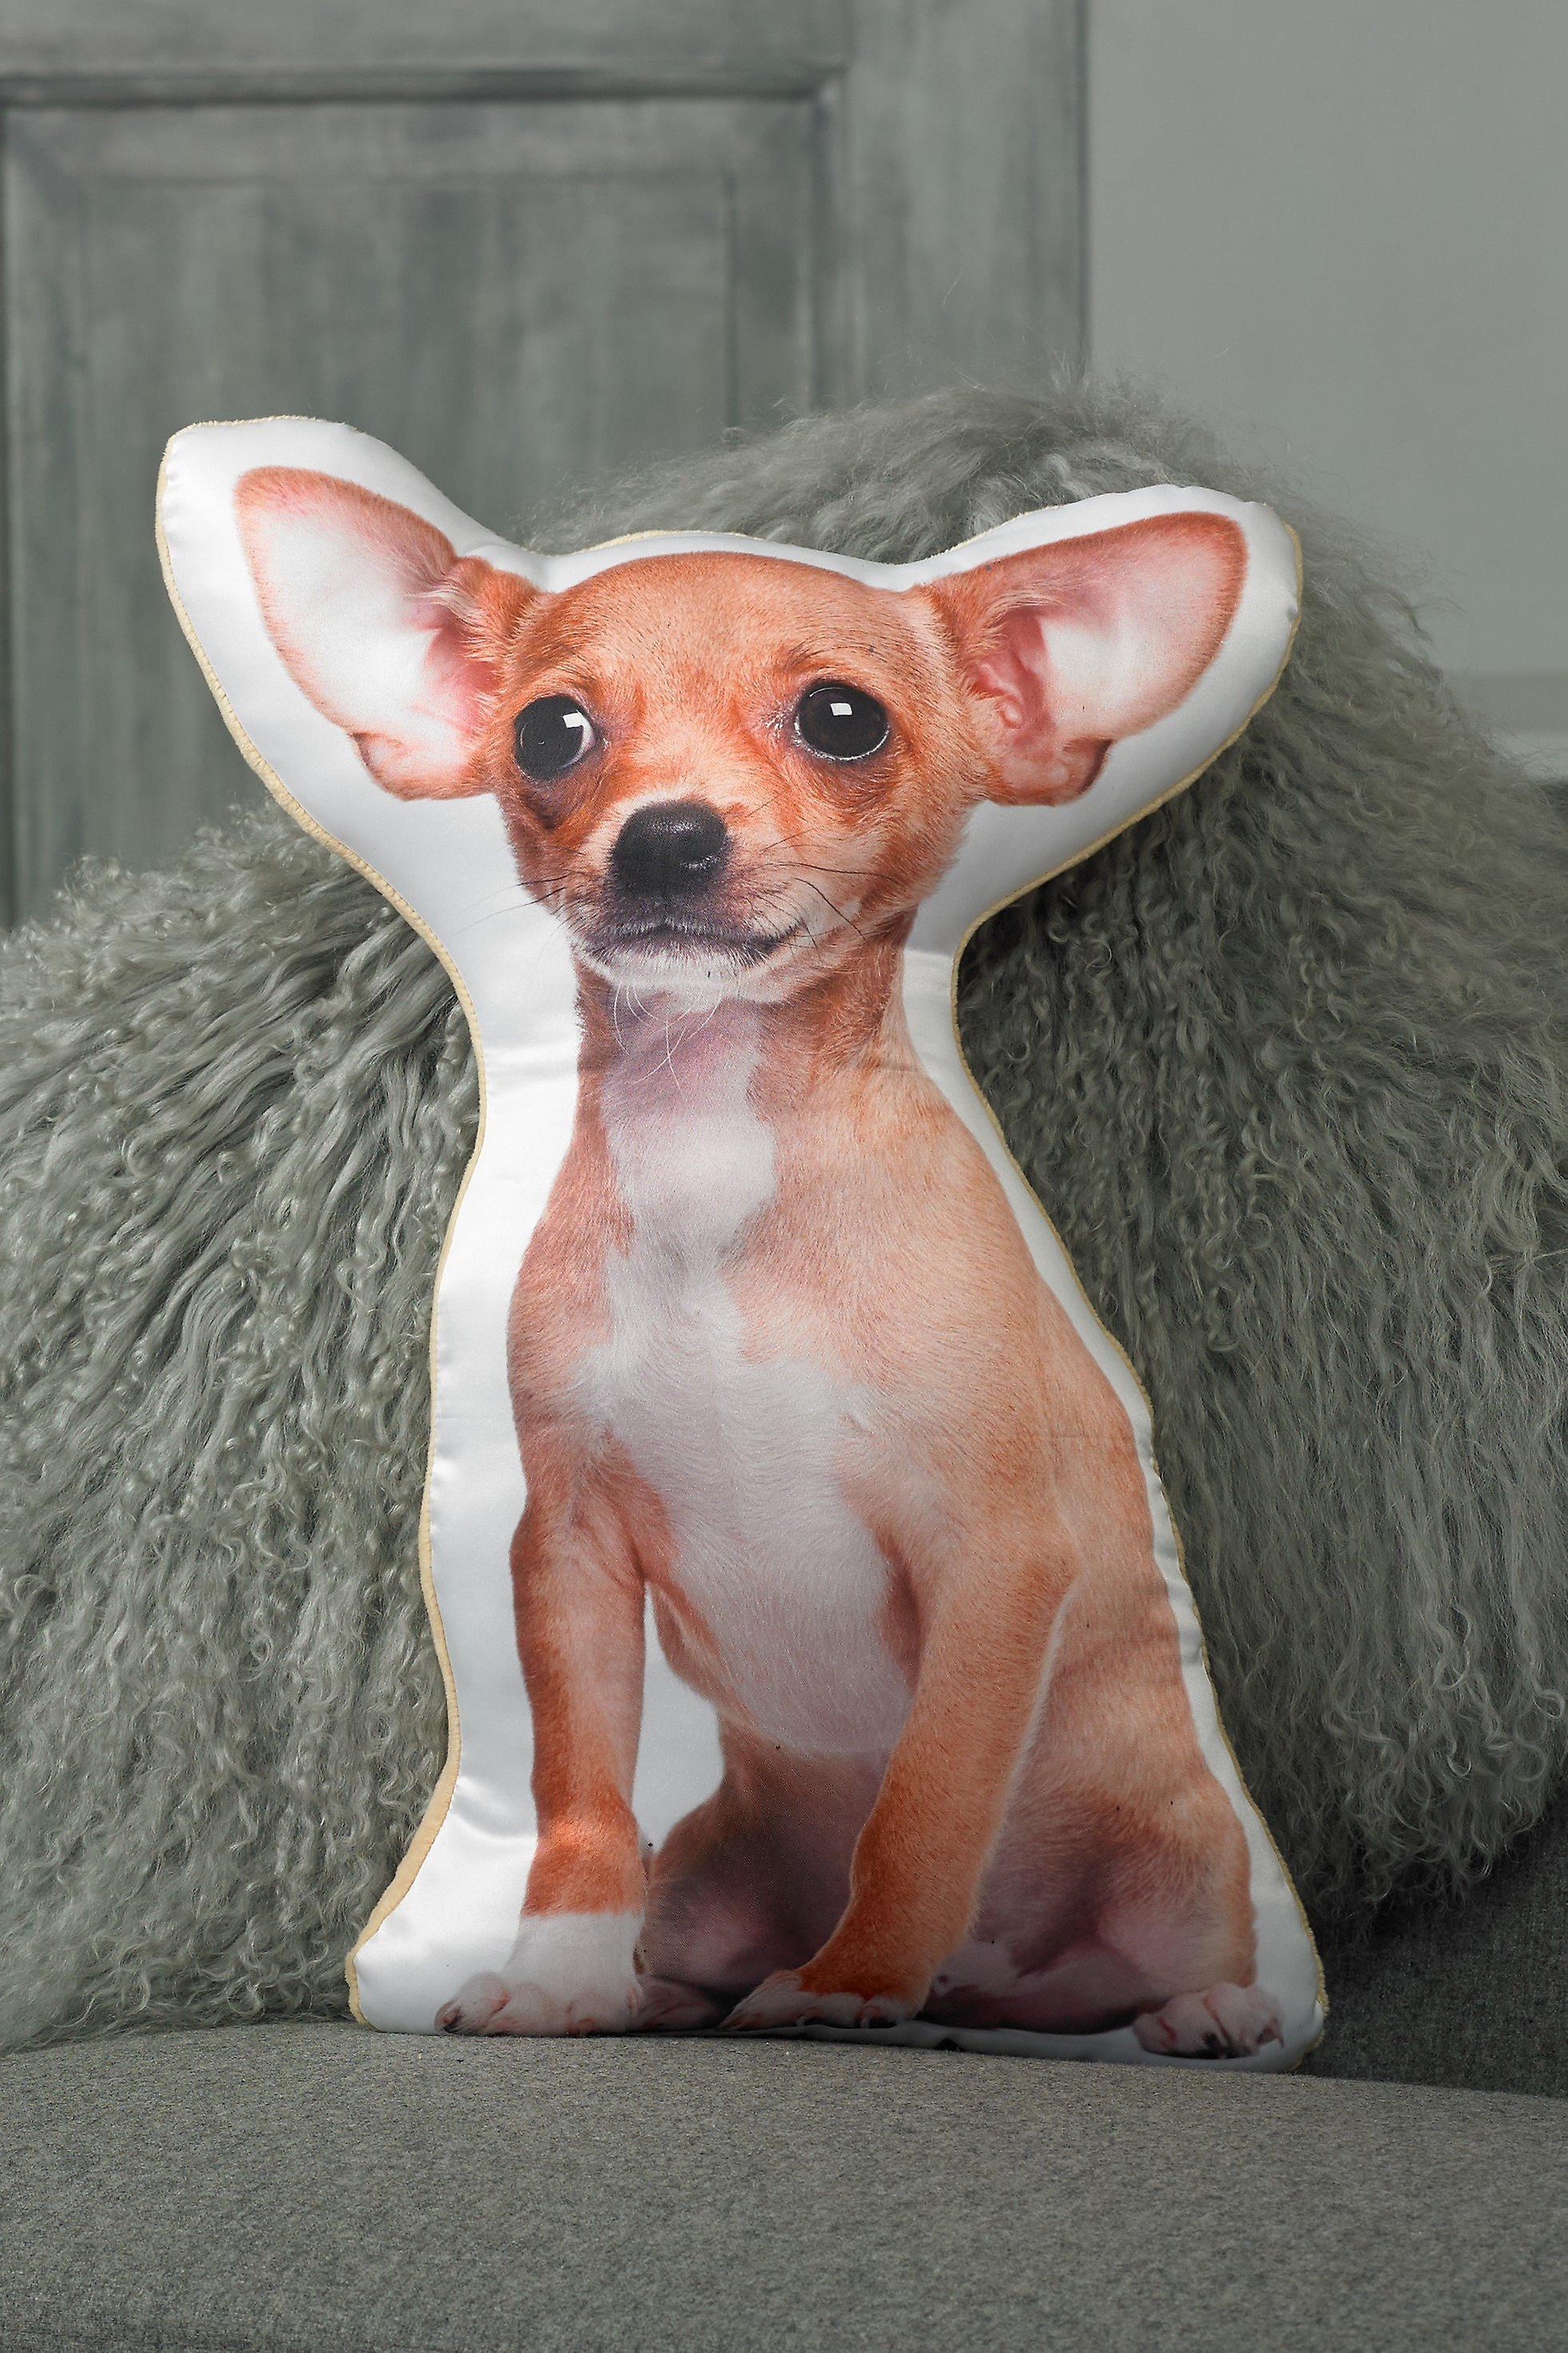 Adorable short haired chihuahua shaped cushion